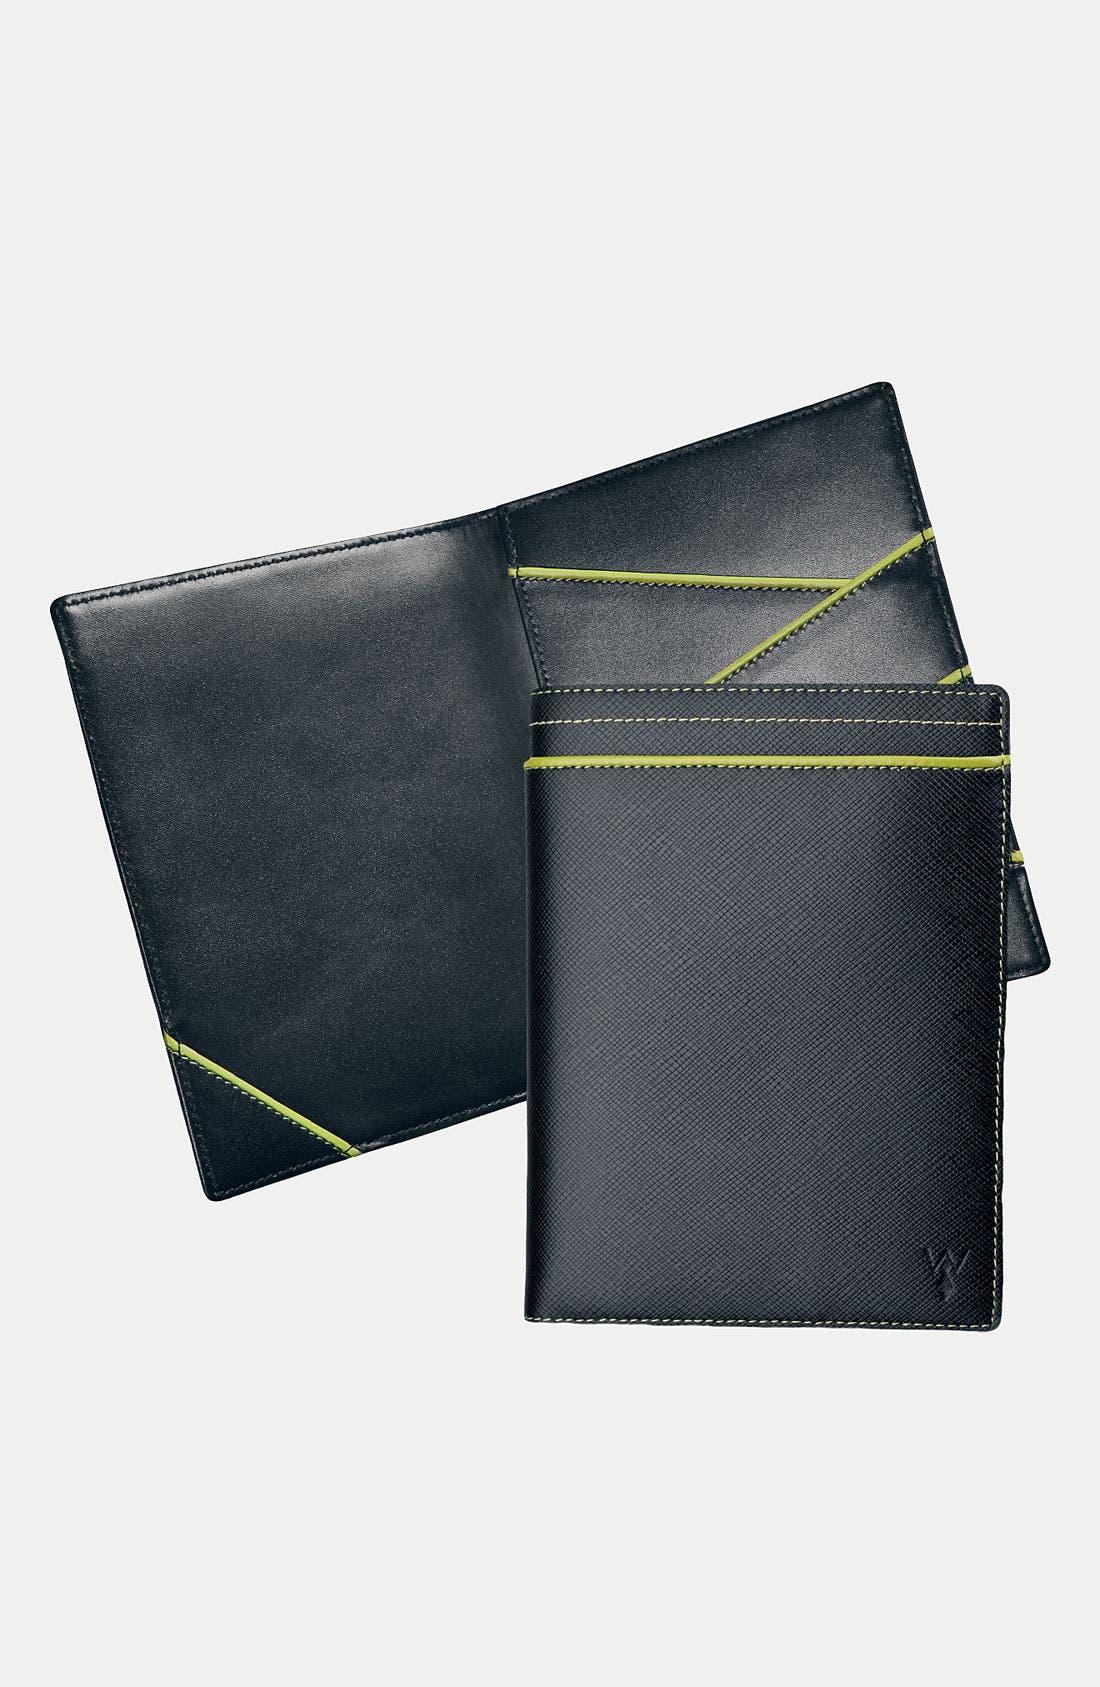 Alternate Image 1 Selected - Würkin Stiffs RFID Blocker Passport Wallet